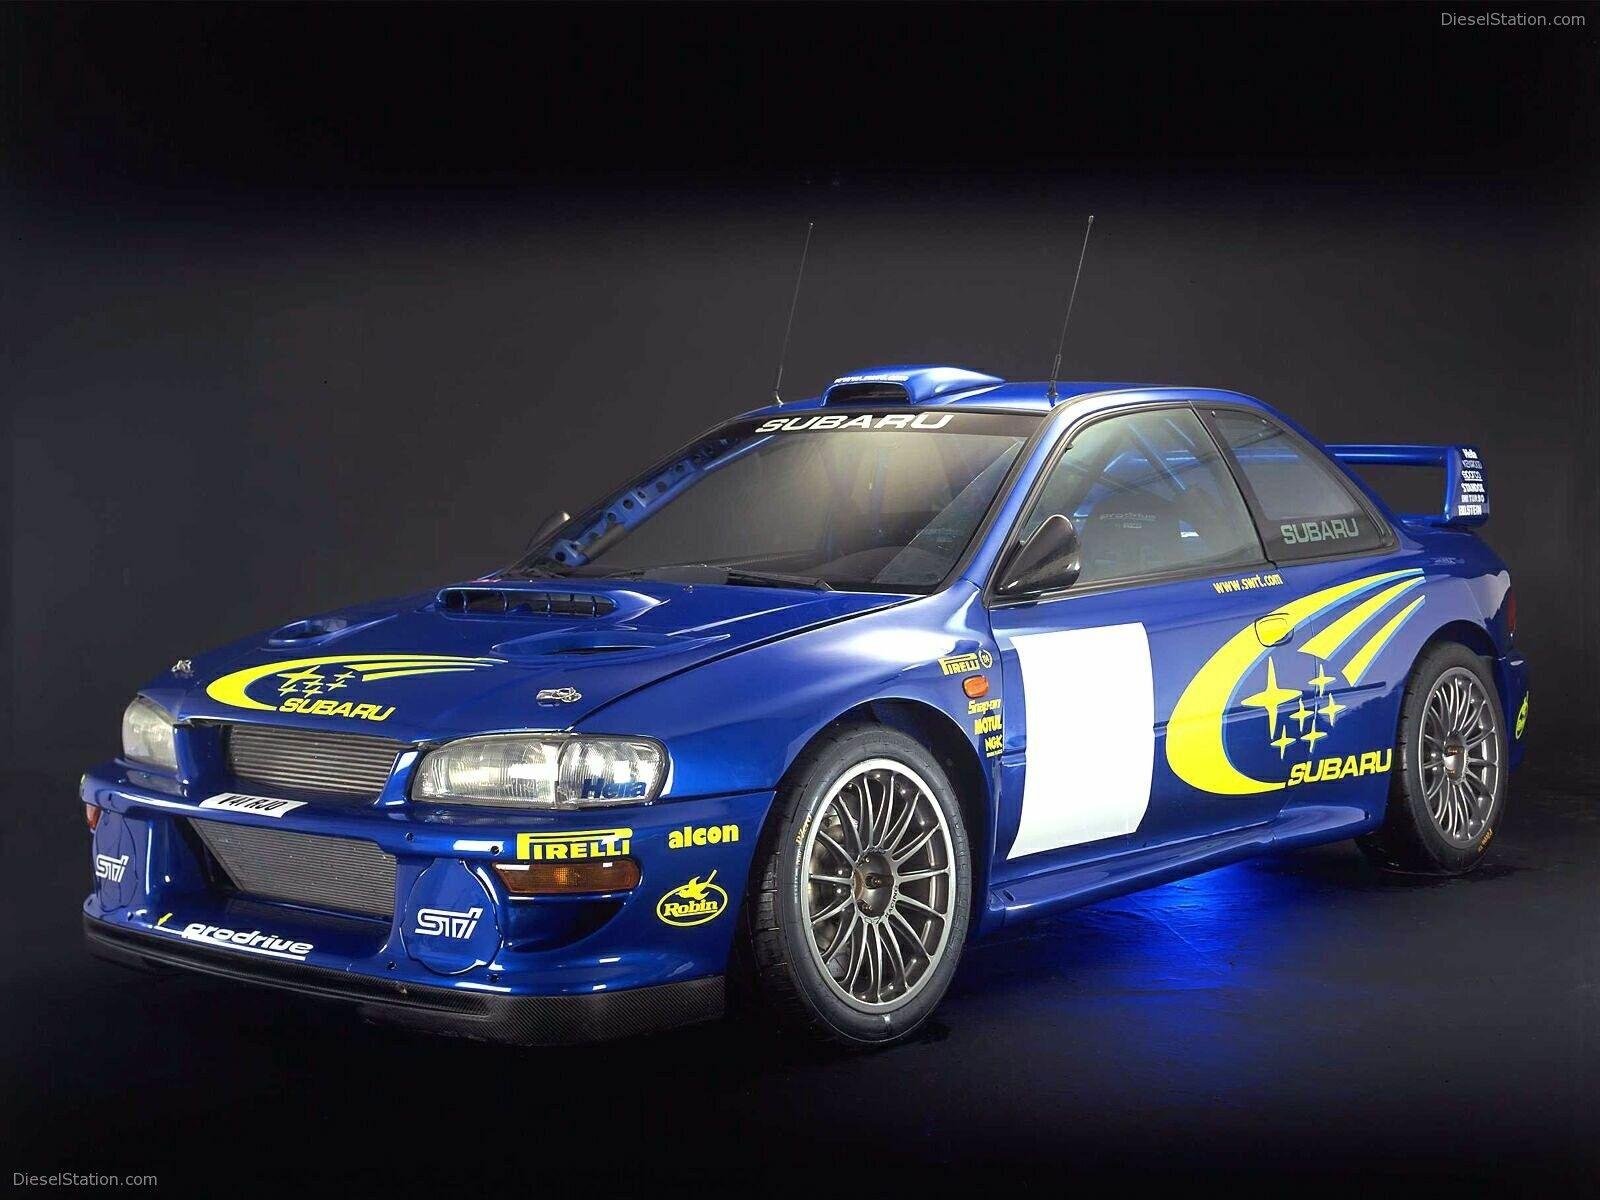 1998 rally impreza 22b sti car lust pinterest rally subaru and subaru impreza. Black Bedroom Furniture Sets. Home Design Ideas